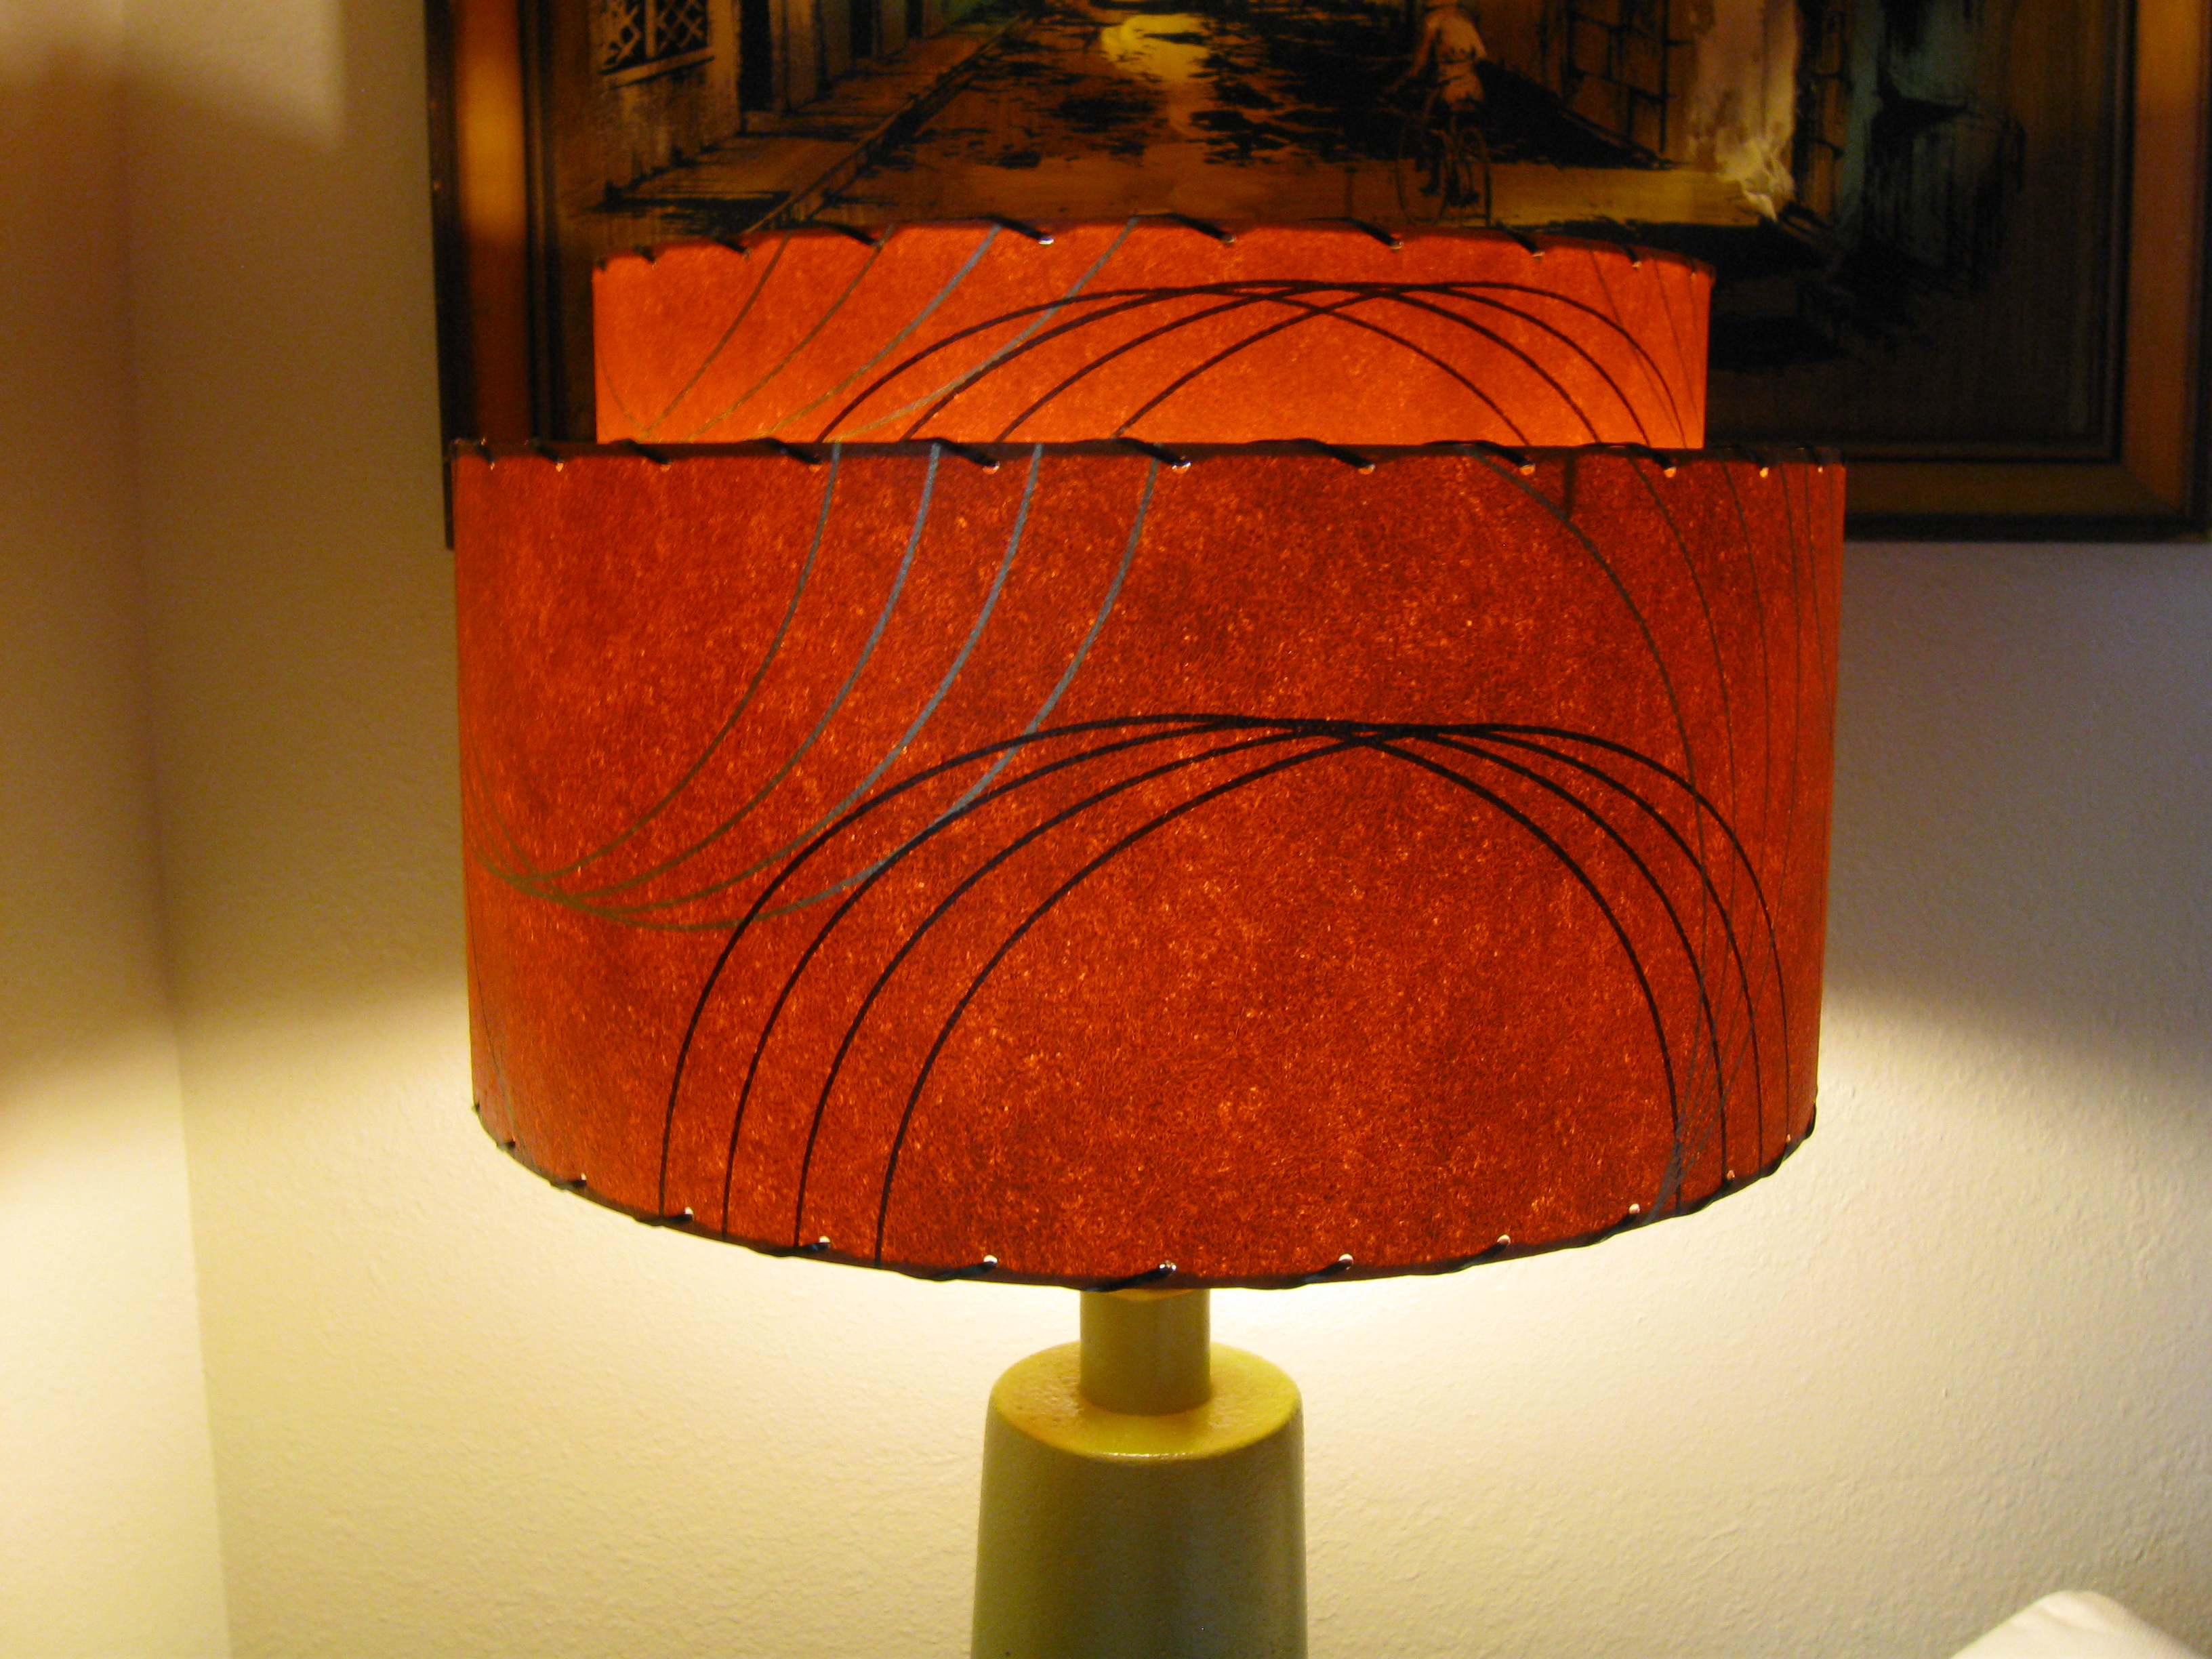 Retromod design reproduction fiberglass lamp shades Light burnt orange paint